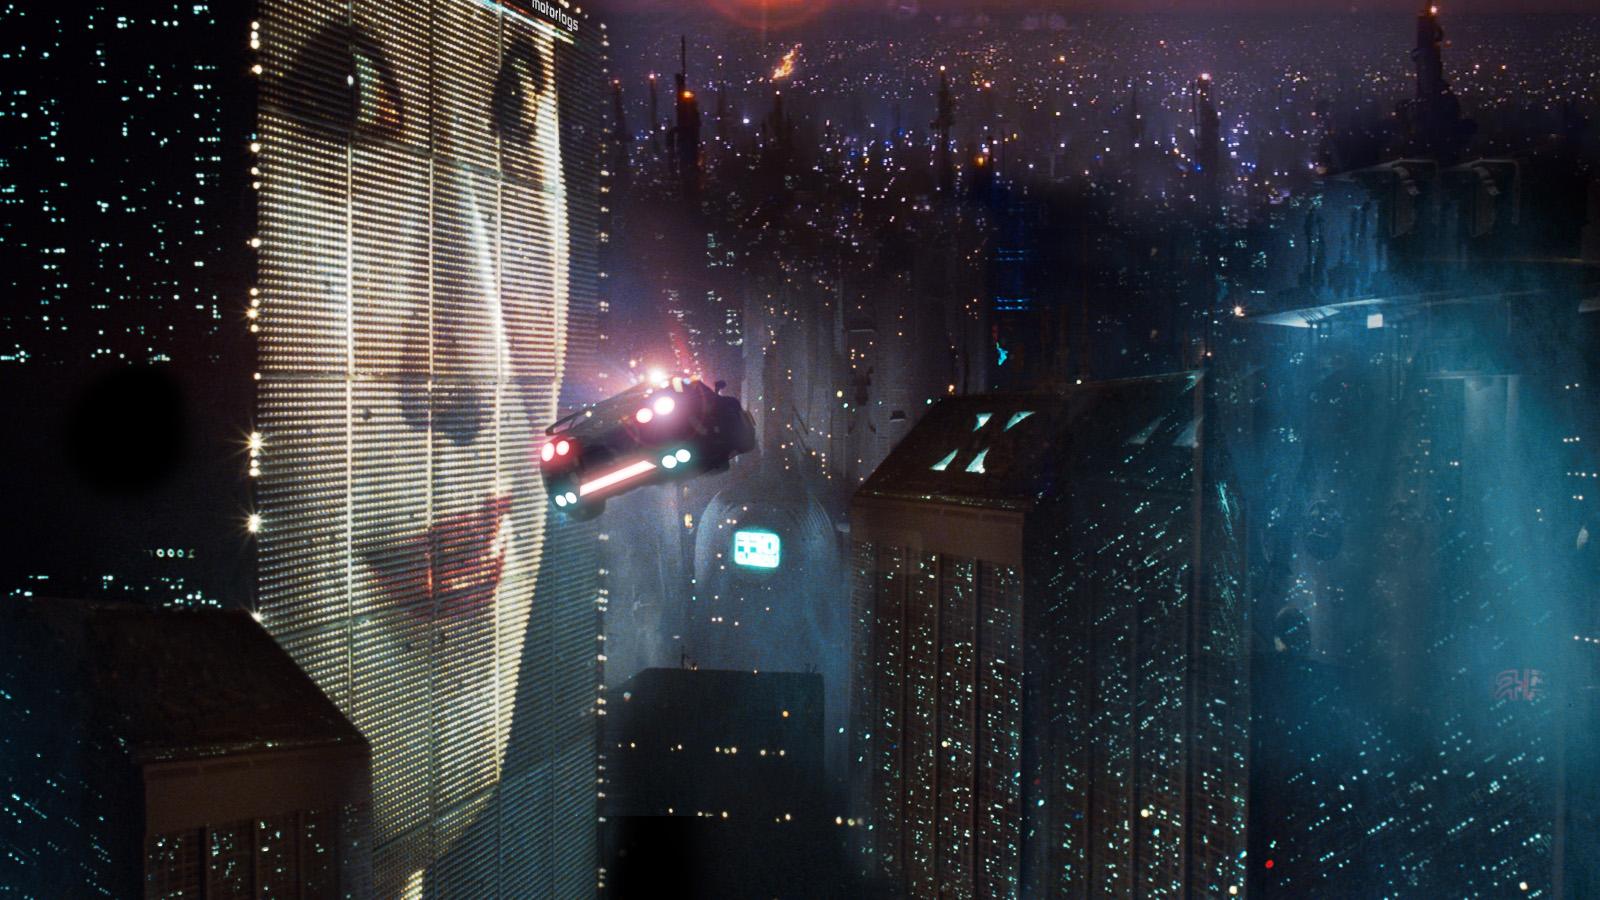 Blade Runner 2049 Wallpapers 29 Wallpapers Adorable Wallpapers